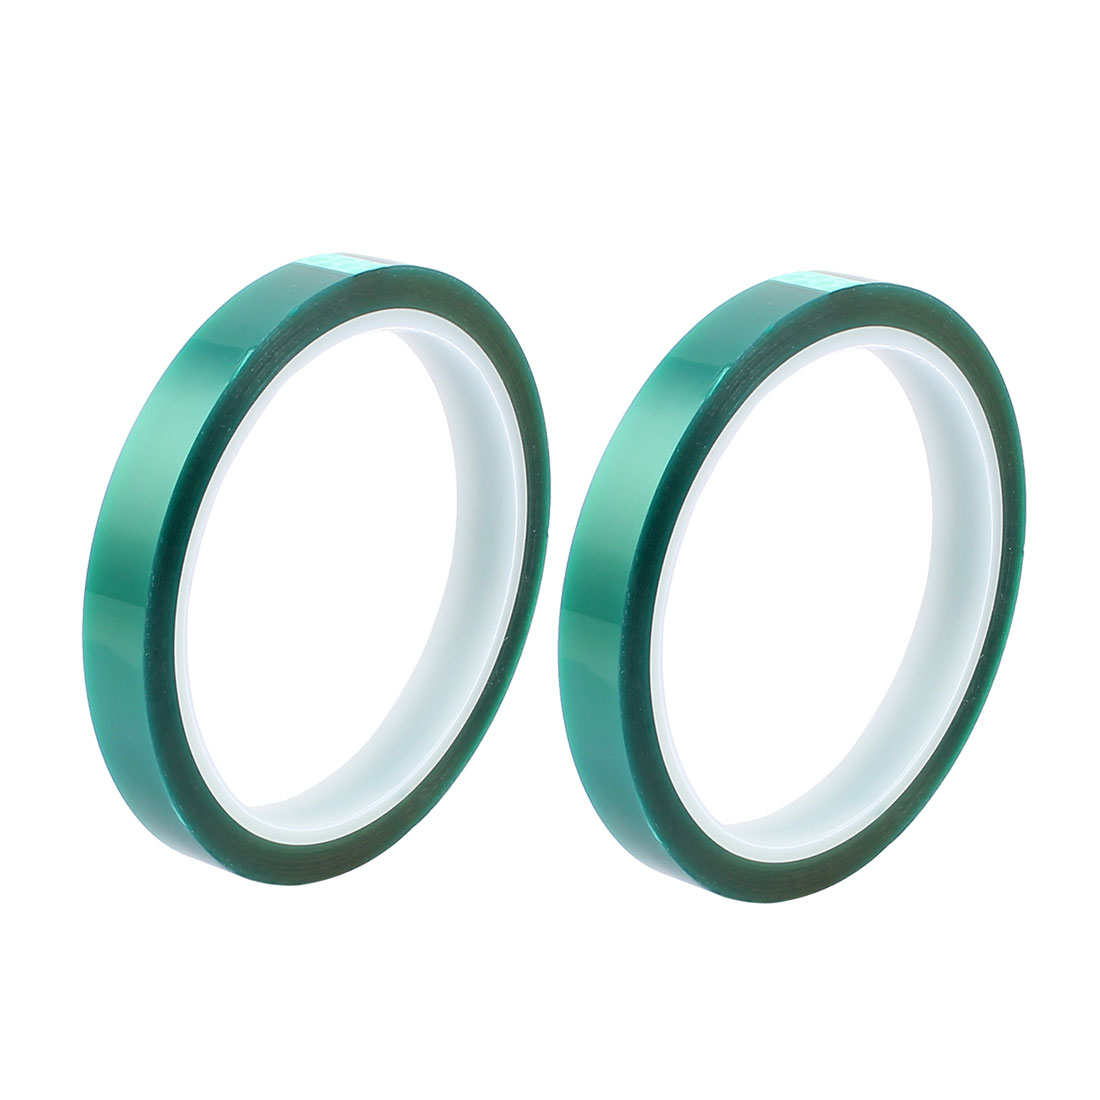 2pcs 12mm Width 33M Long Green PET High Temperature Heat Resistant PCB Solder Tape